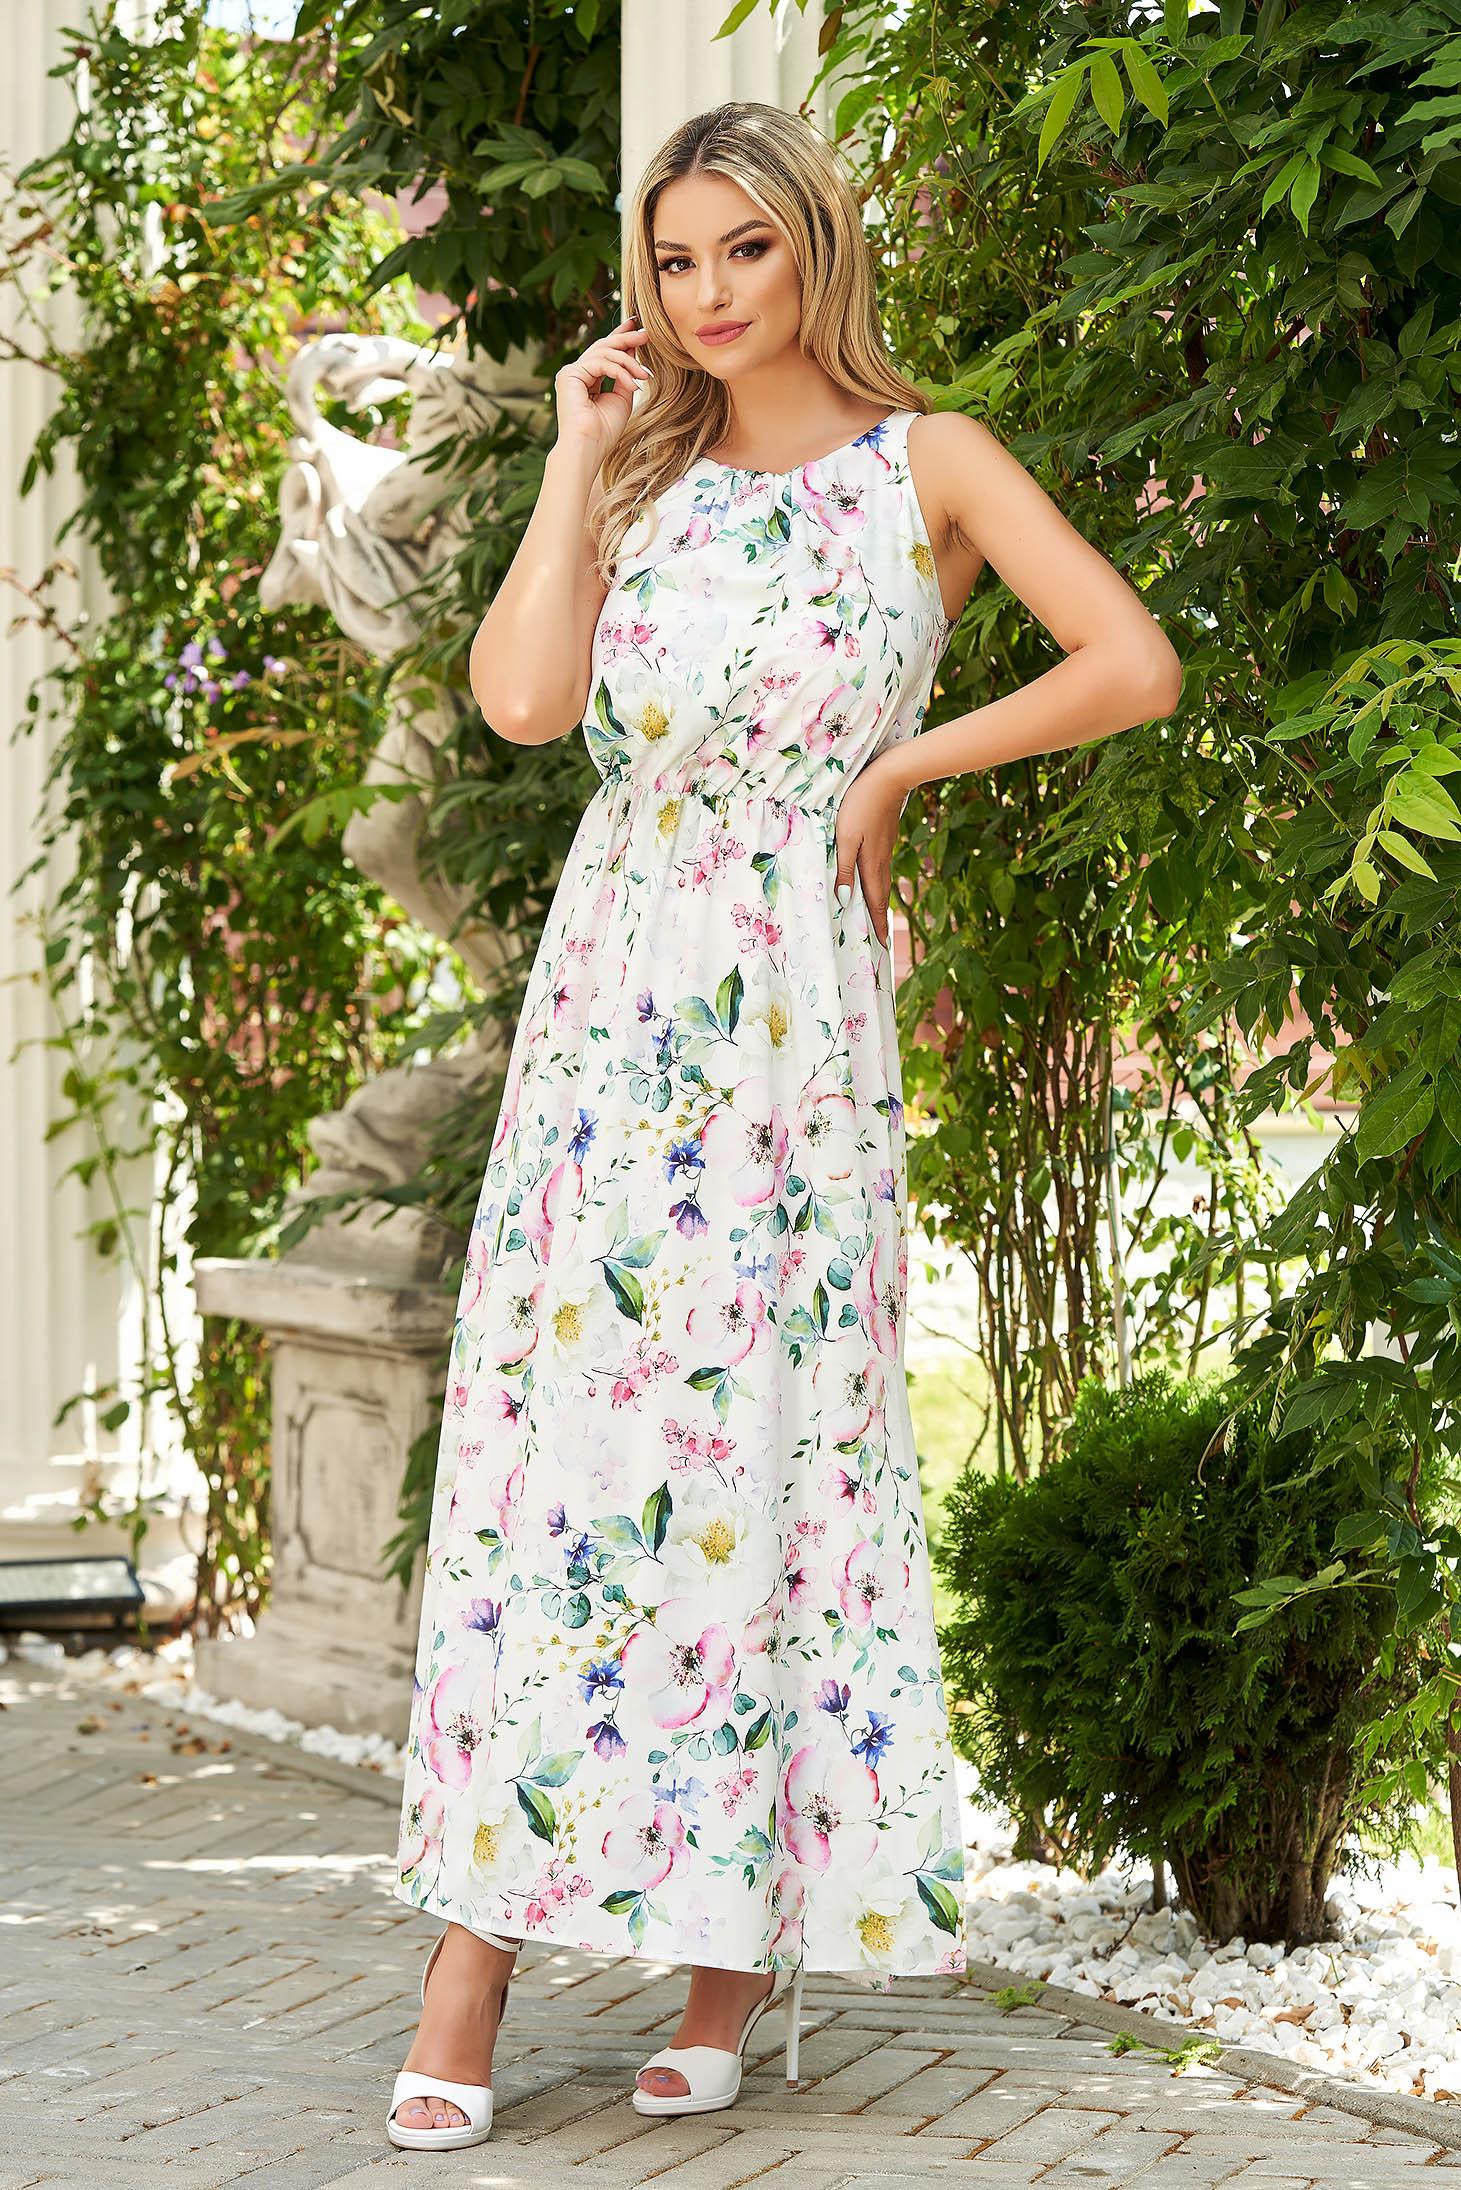 StarShinerS white dress elegant daily cloche with elastic waist airy fabric